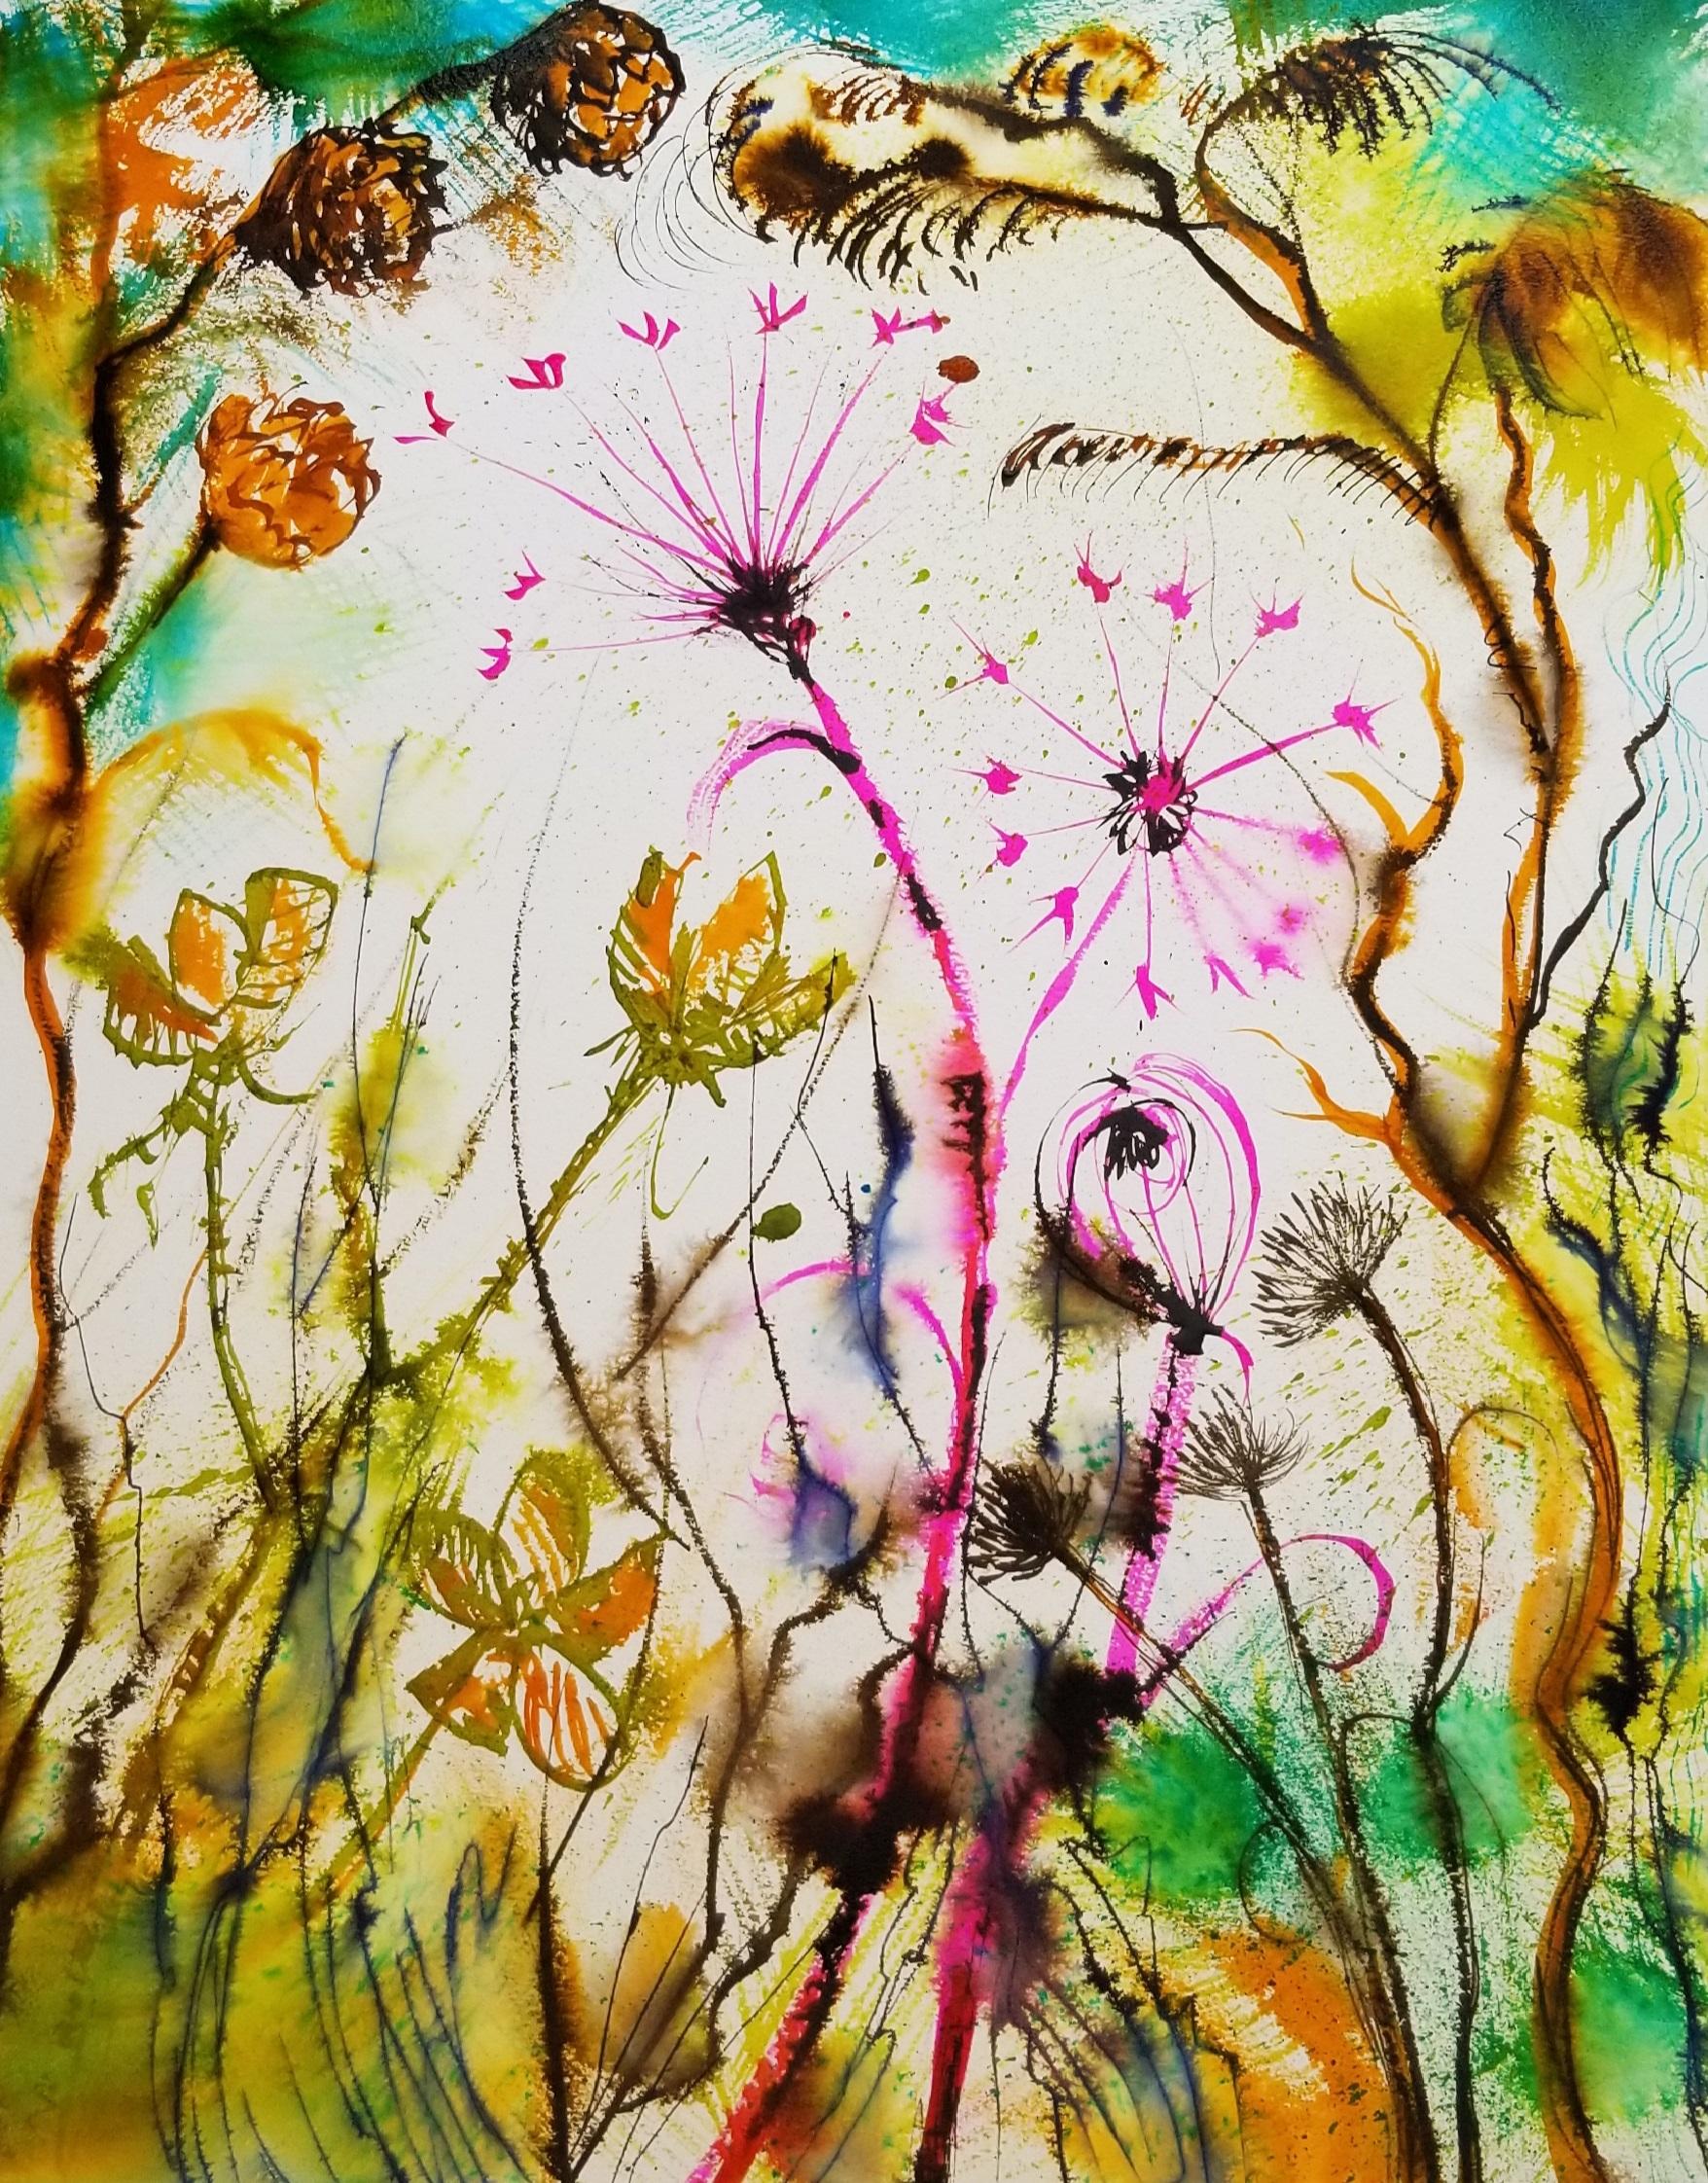 Winter Plants #5 ink on Arches board 16x20 by Nancy Boyle.jpg